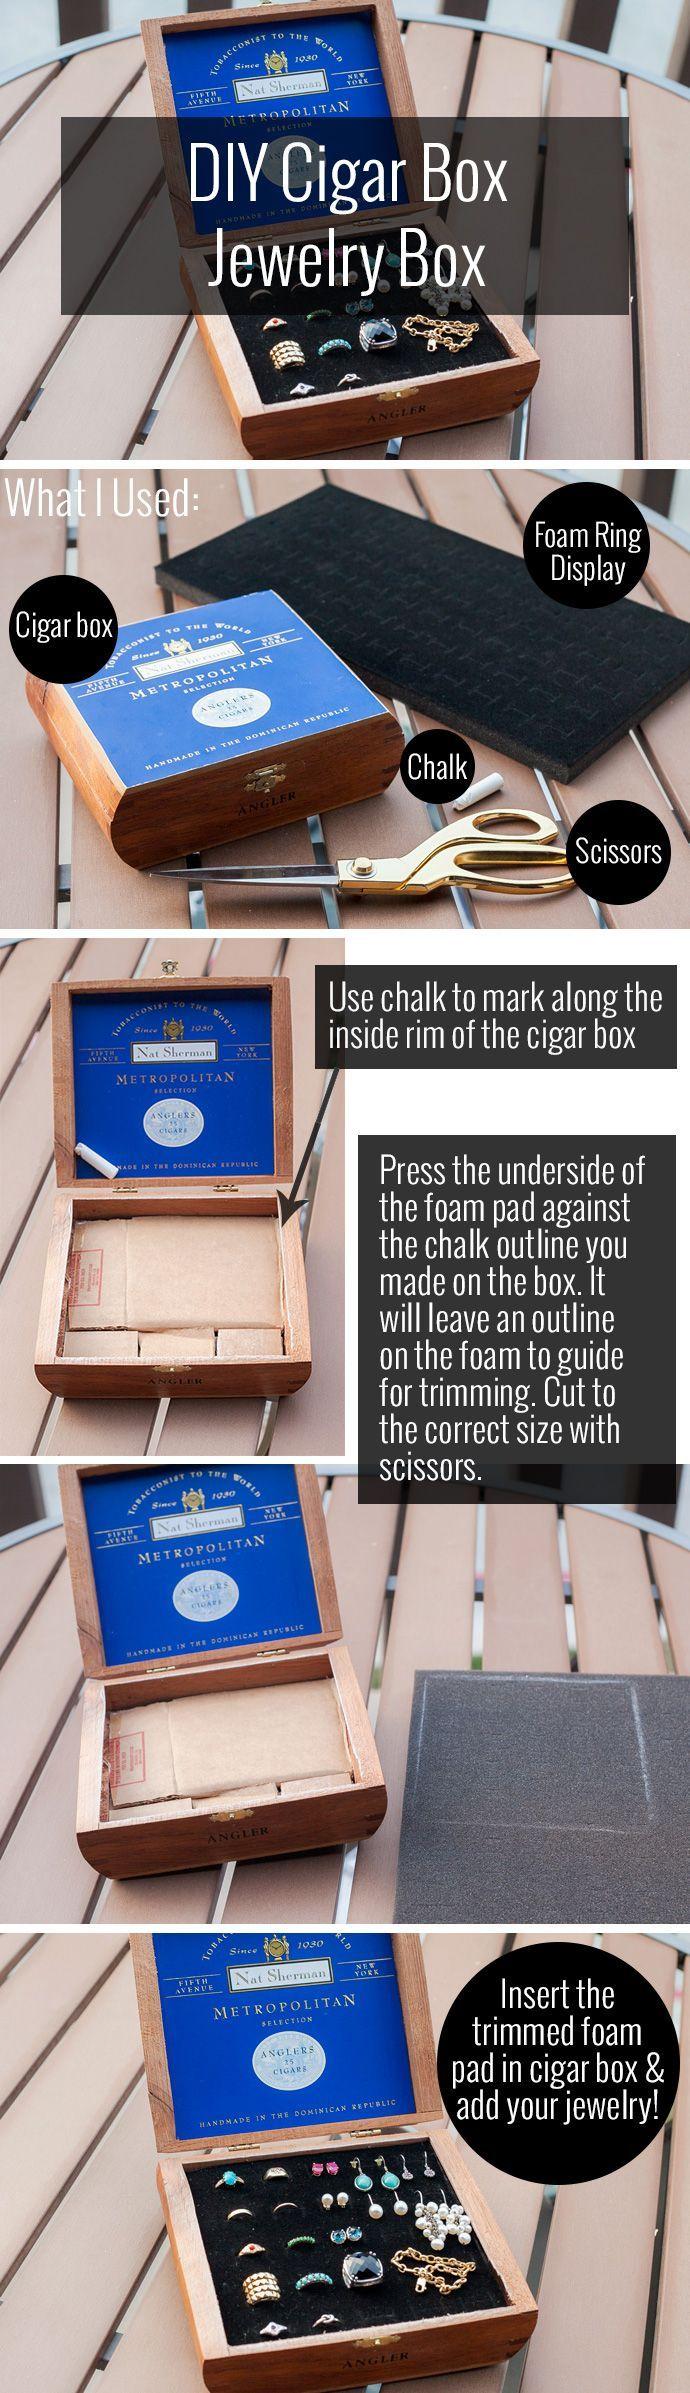 DIY Cigar Box Jewelry Box Jewerly box diy, Jewelry box